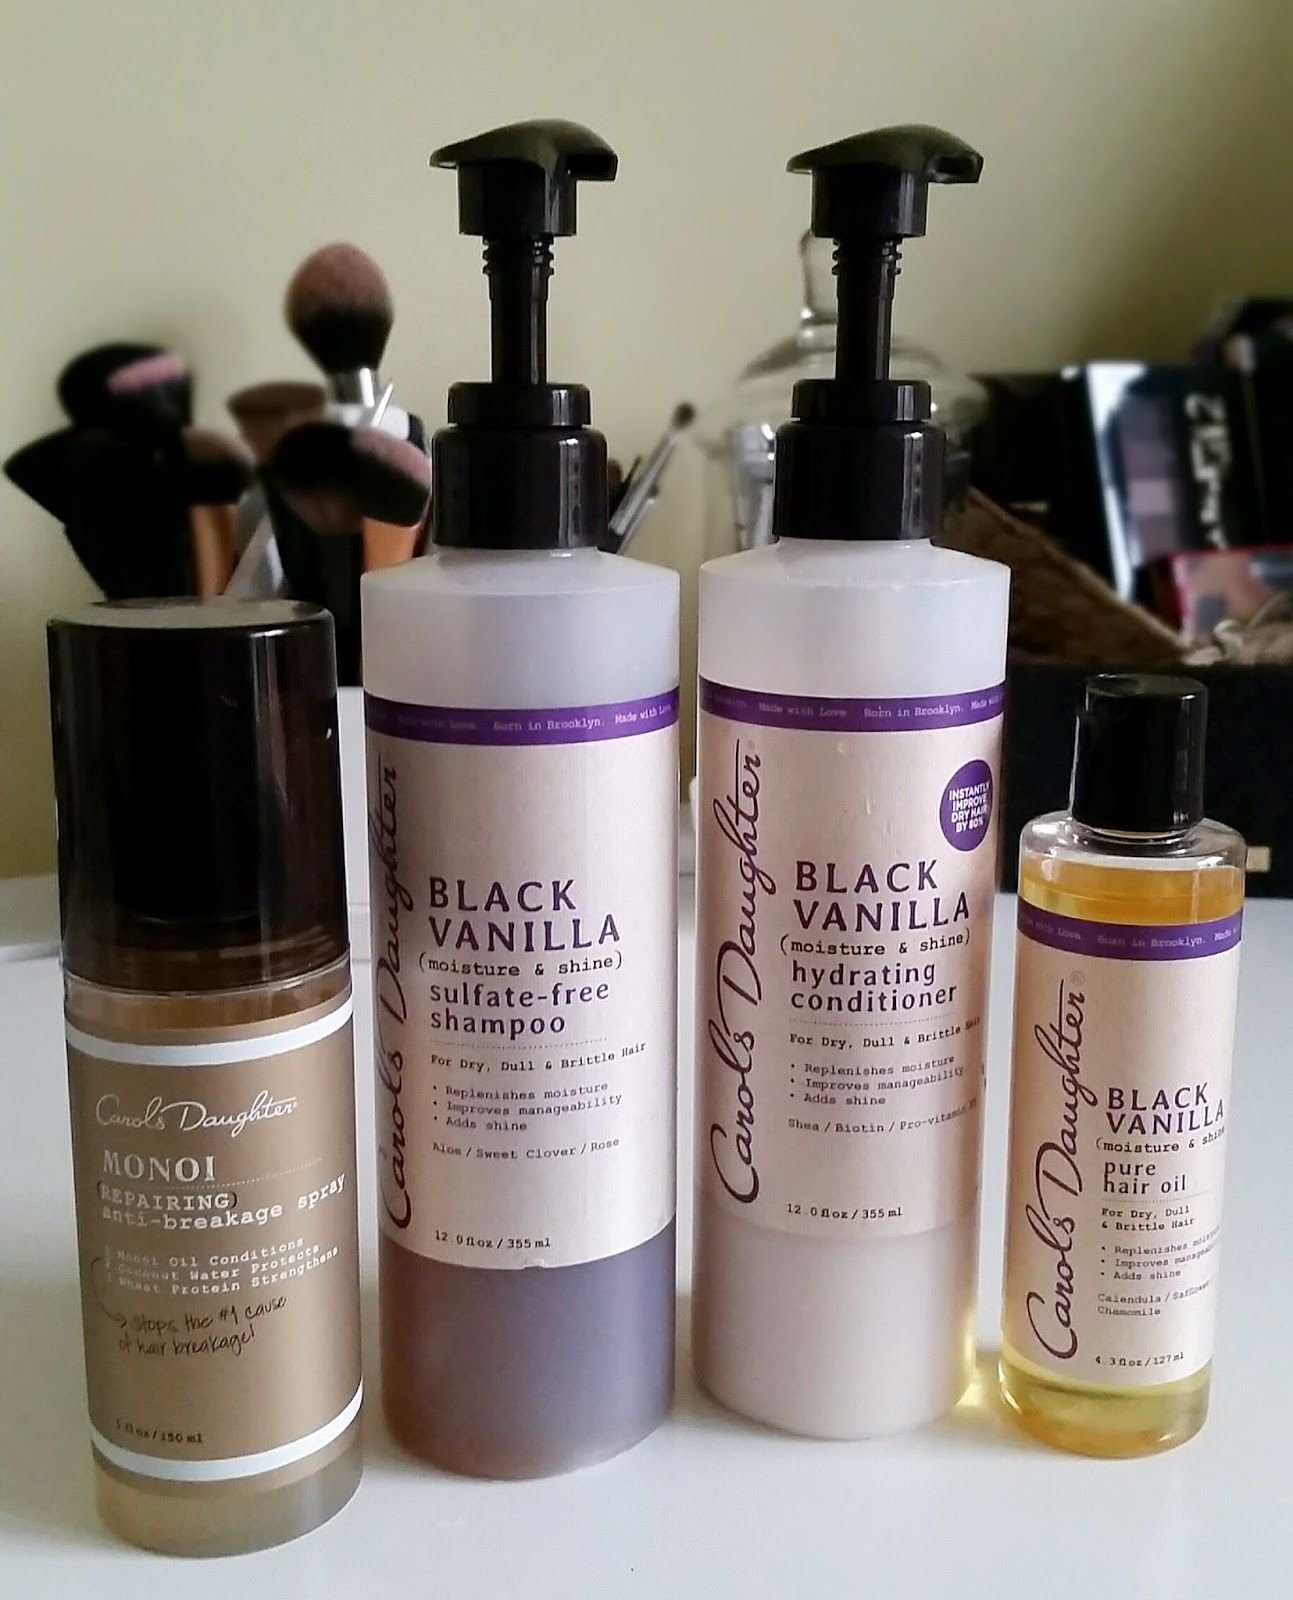 carol's daughter black vanilla review Natural hair